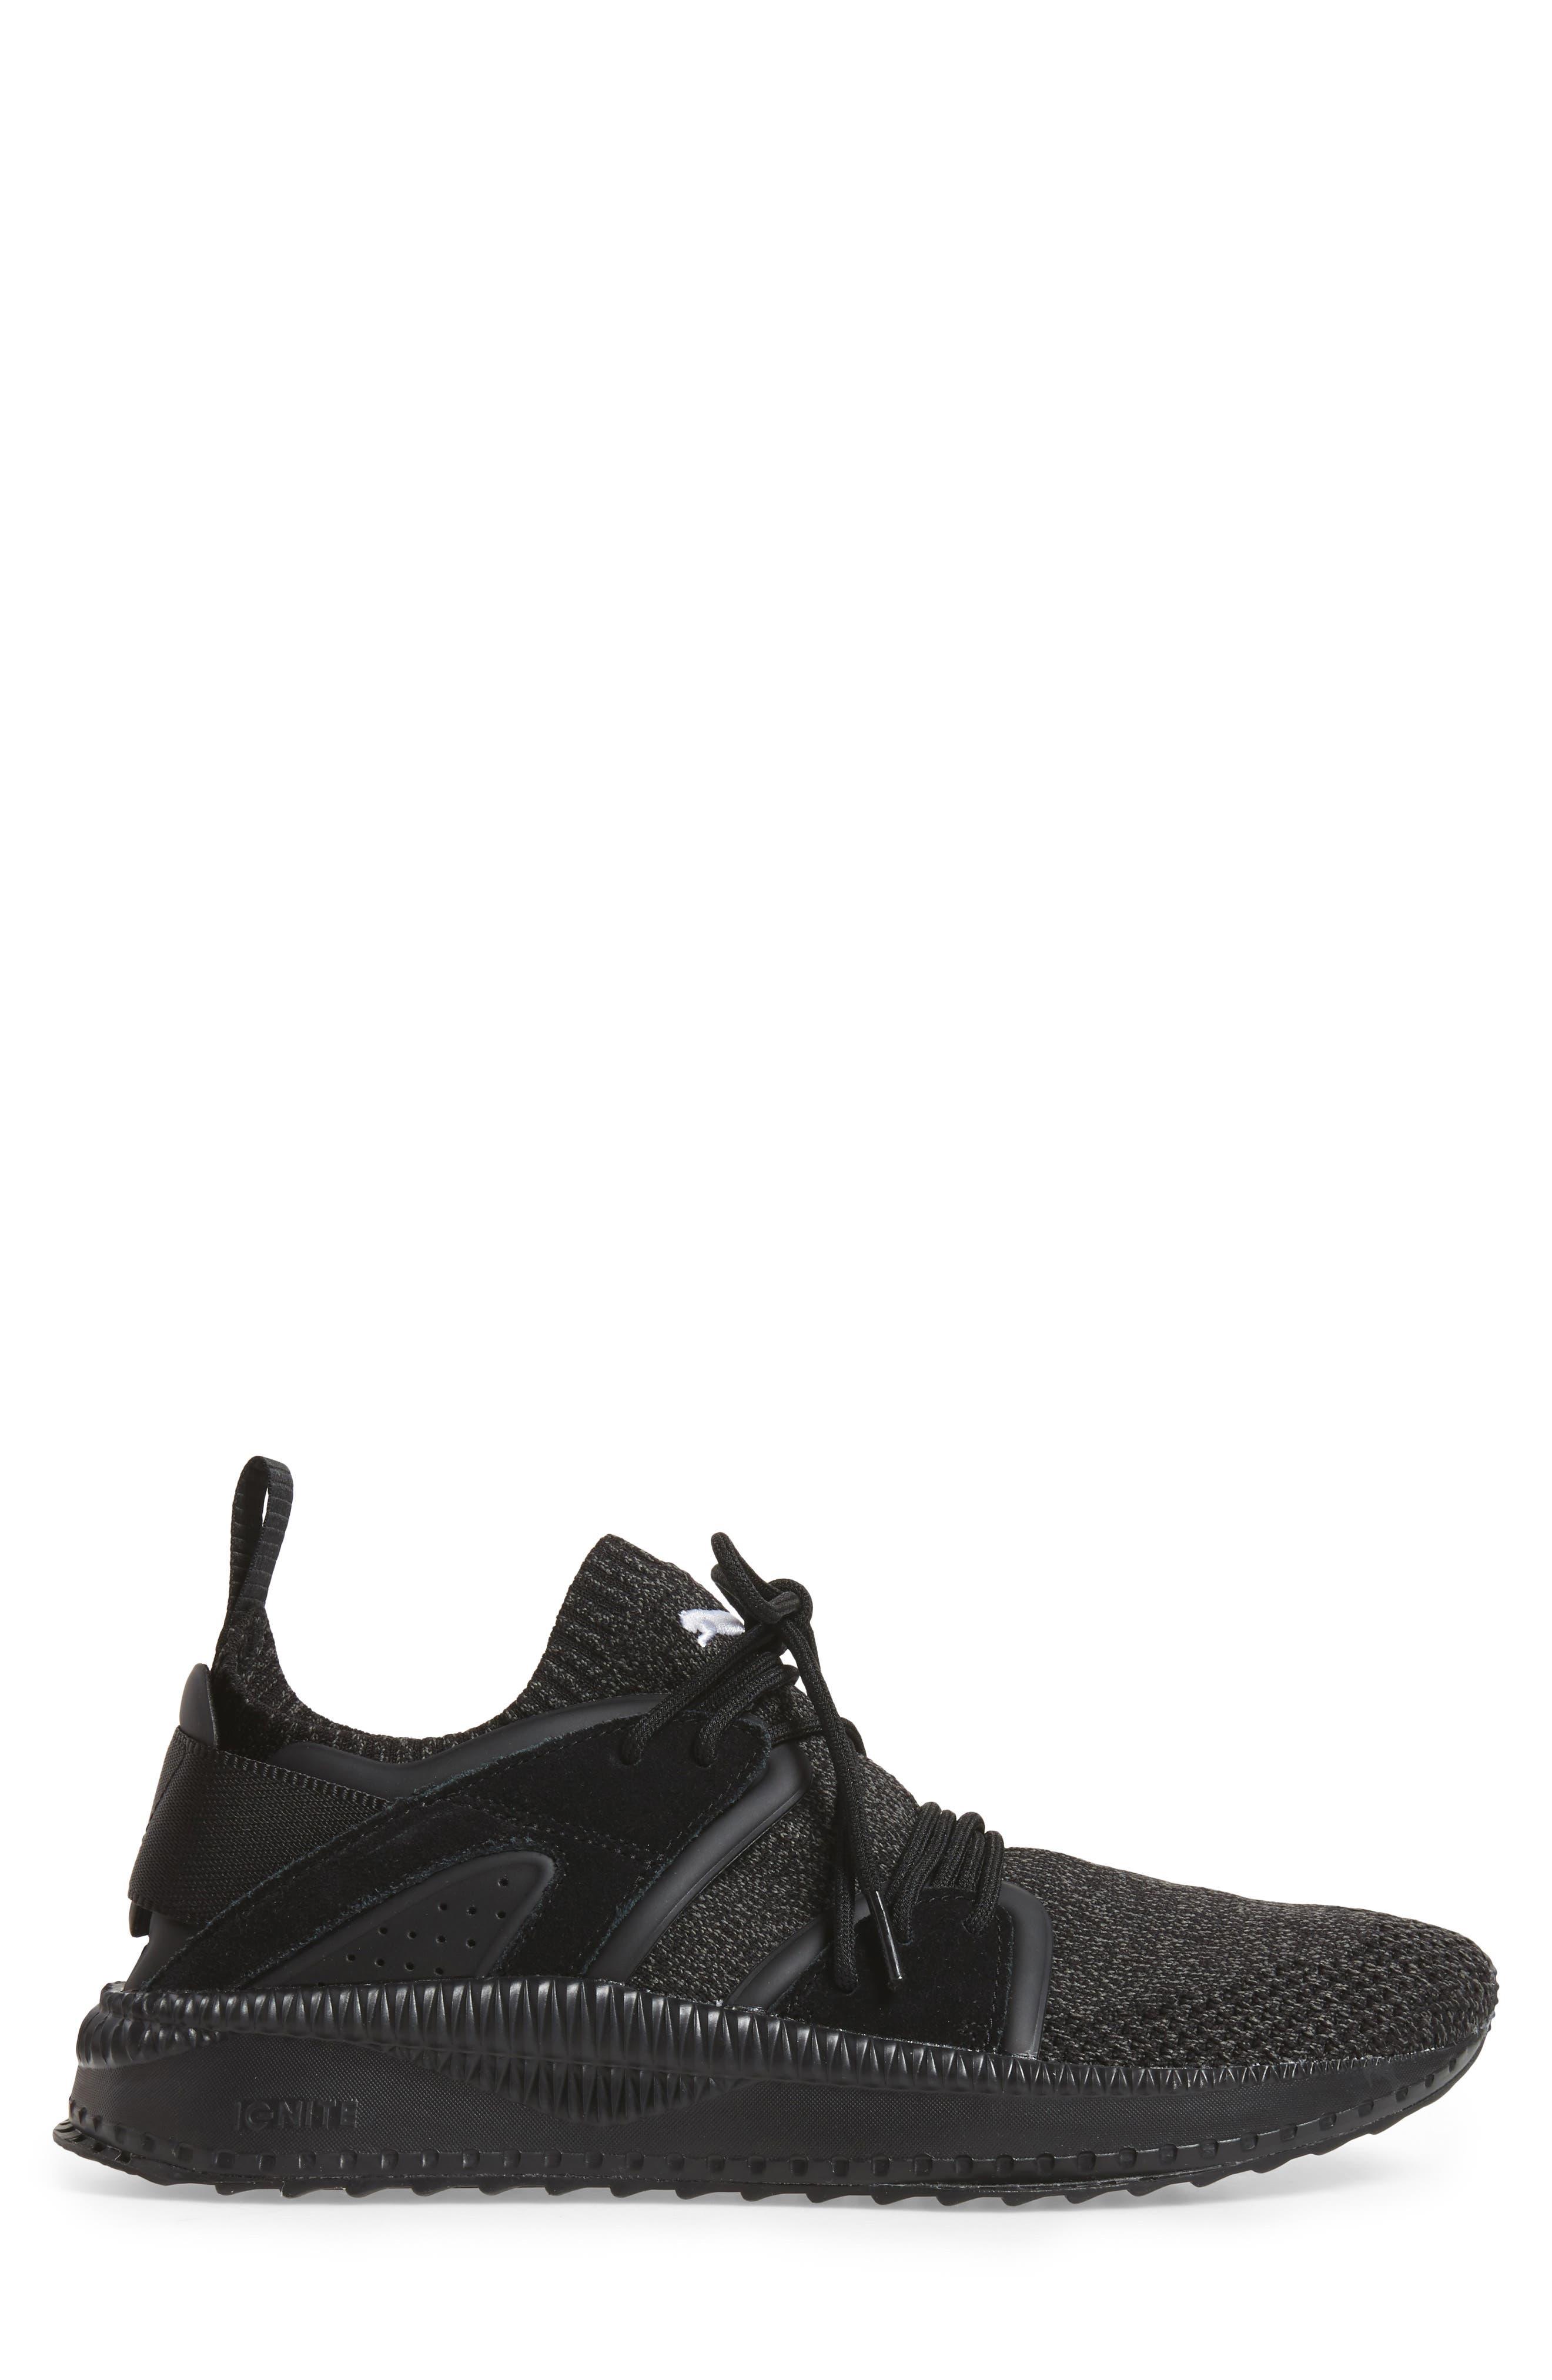 Tsugi Blaze EvoKnit Sneaker,                             Alternate thumbnail 3, color,